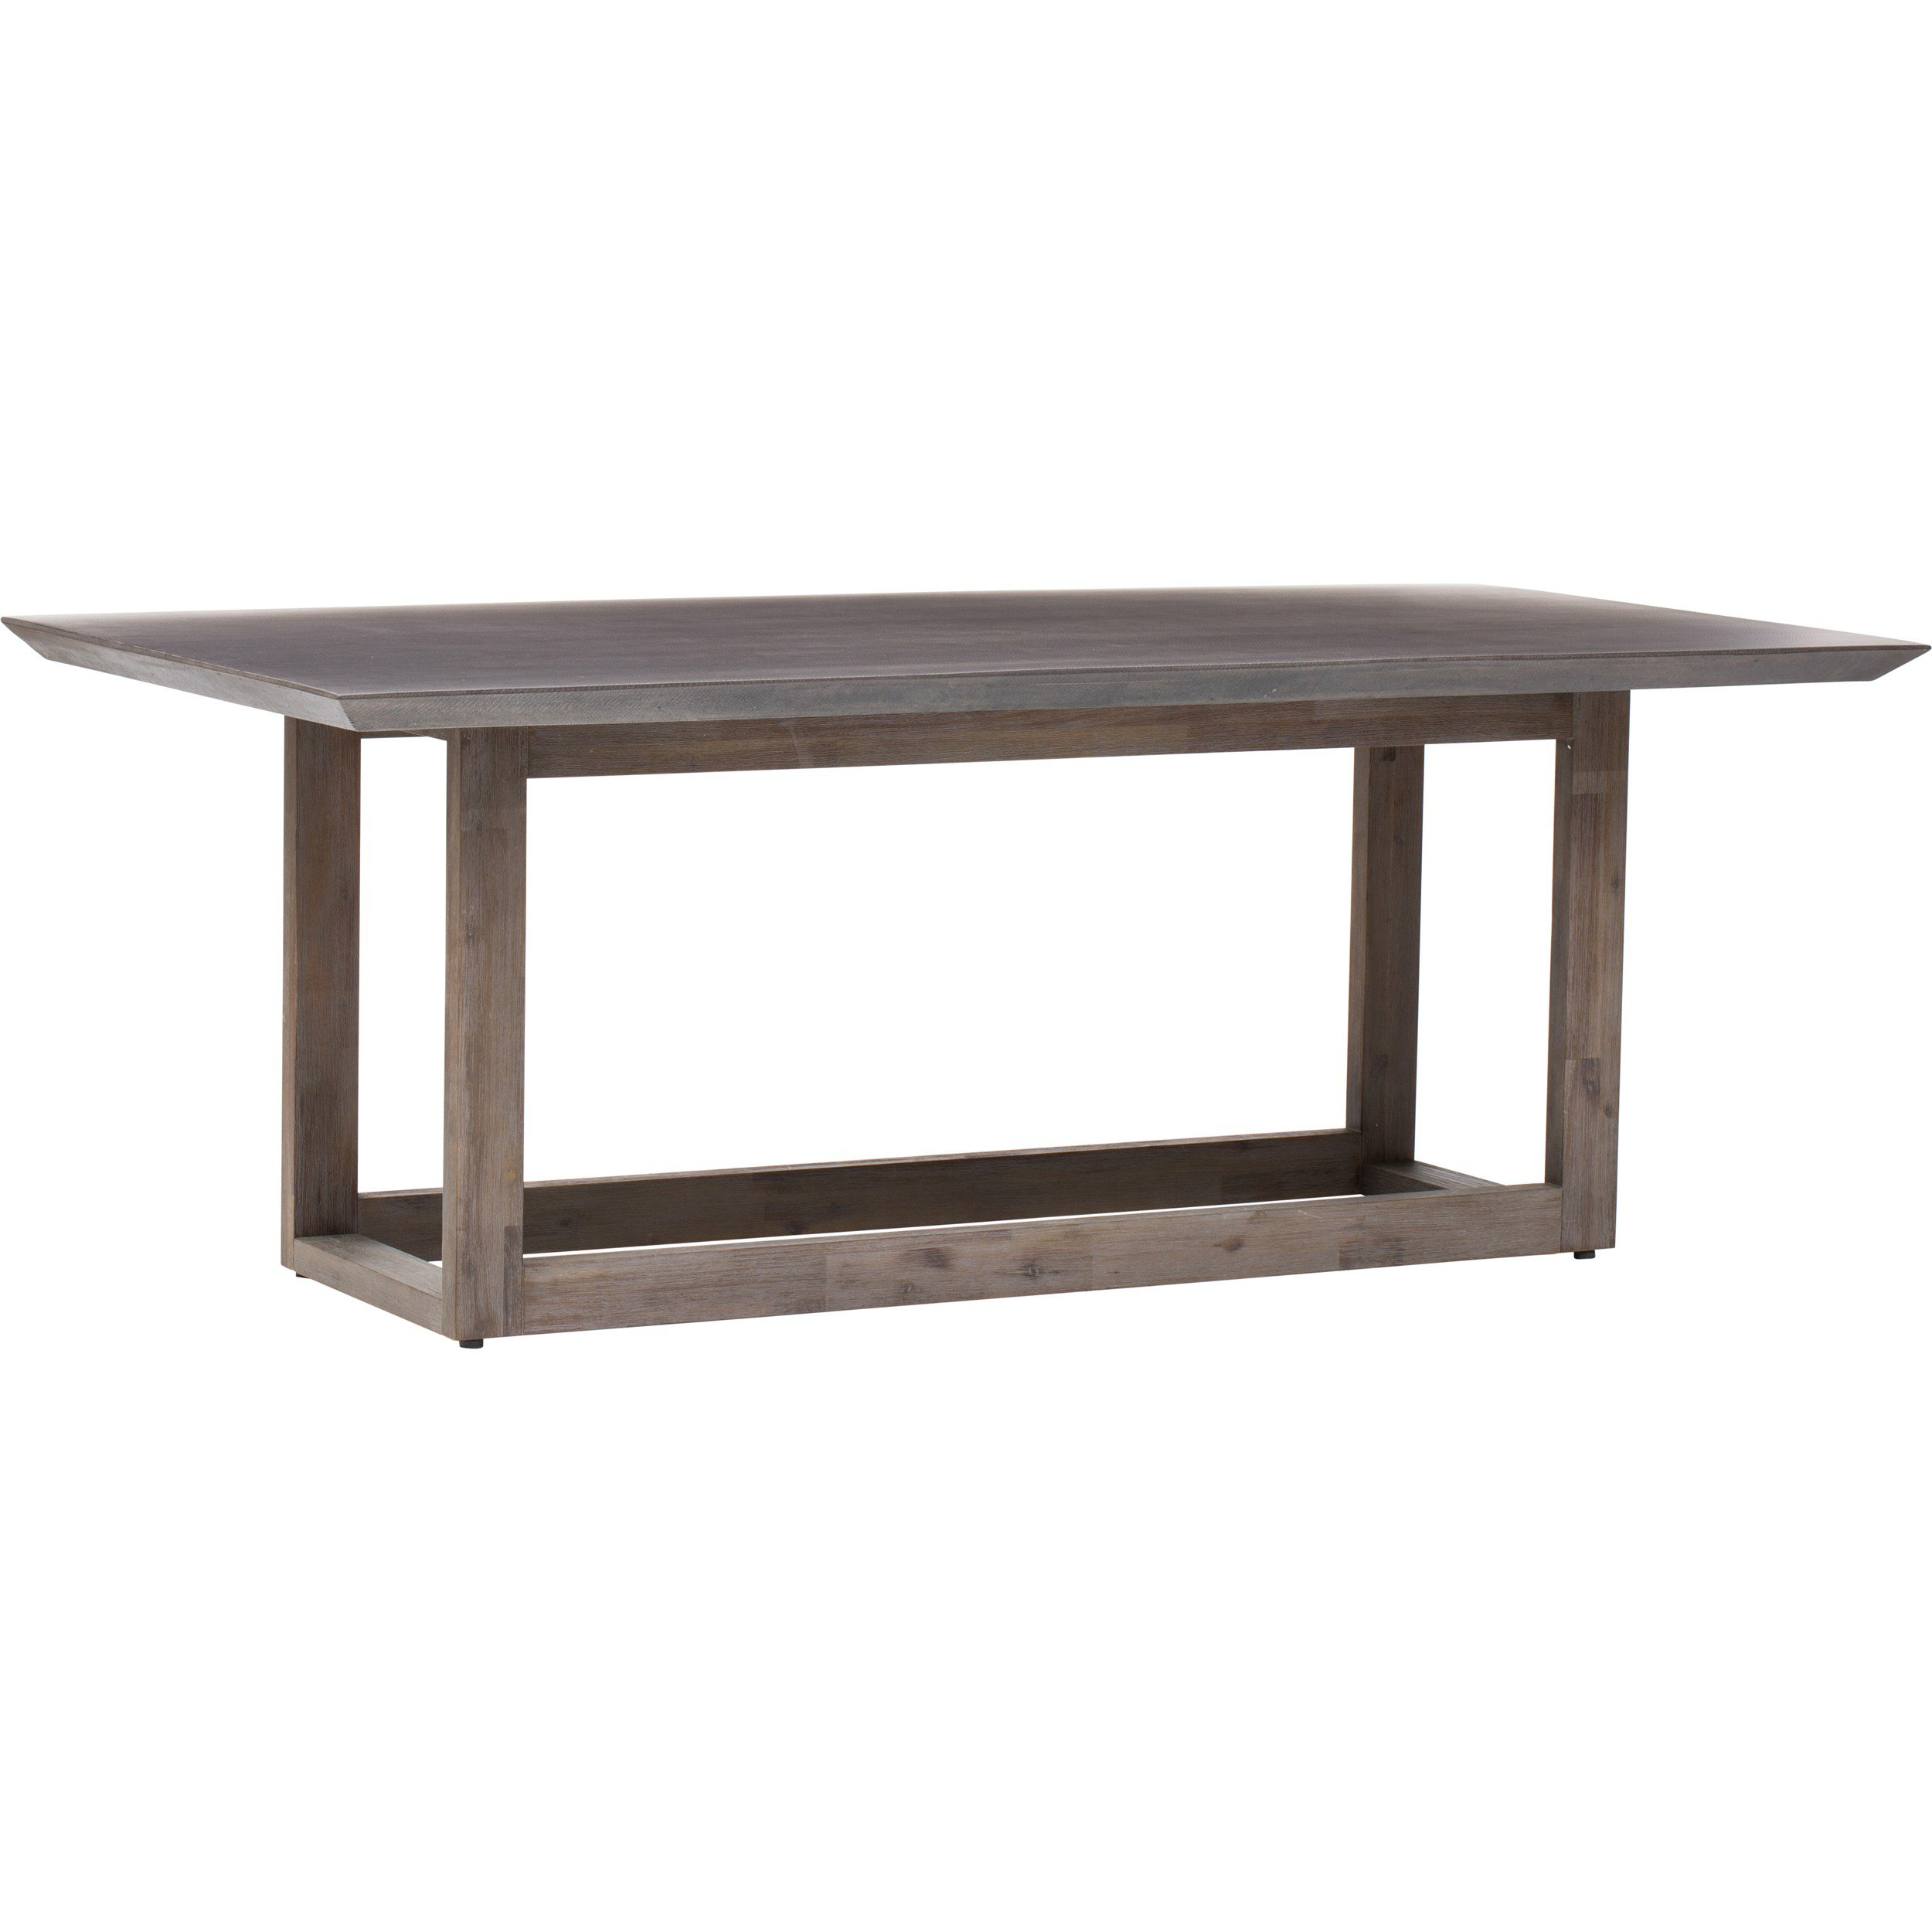 Marren Dining Table, $1,199.